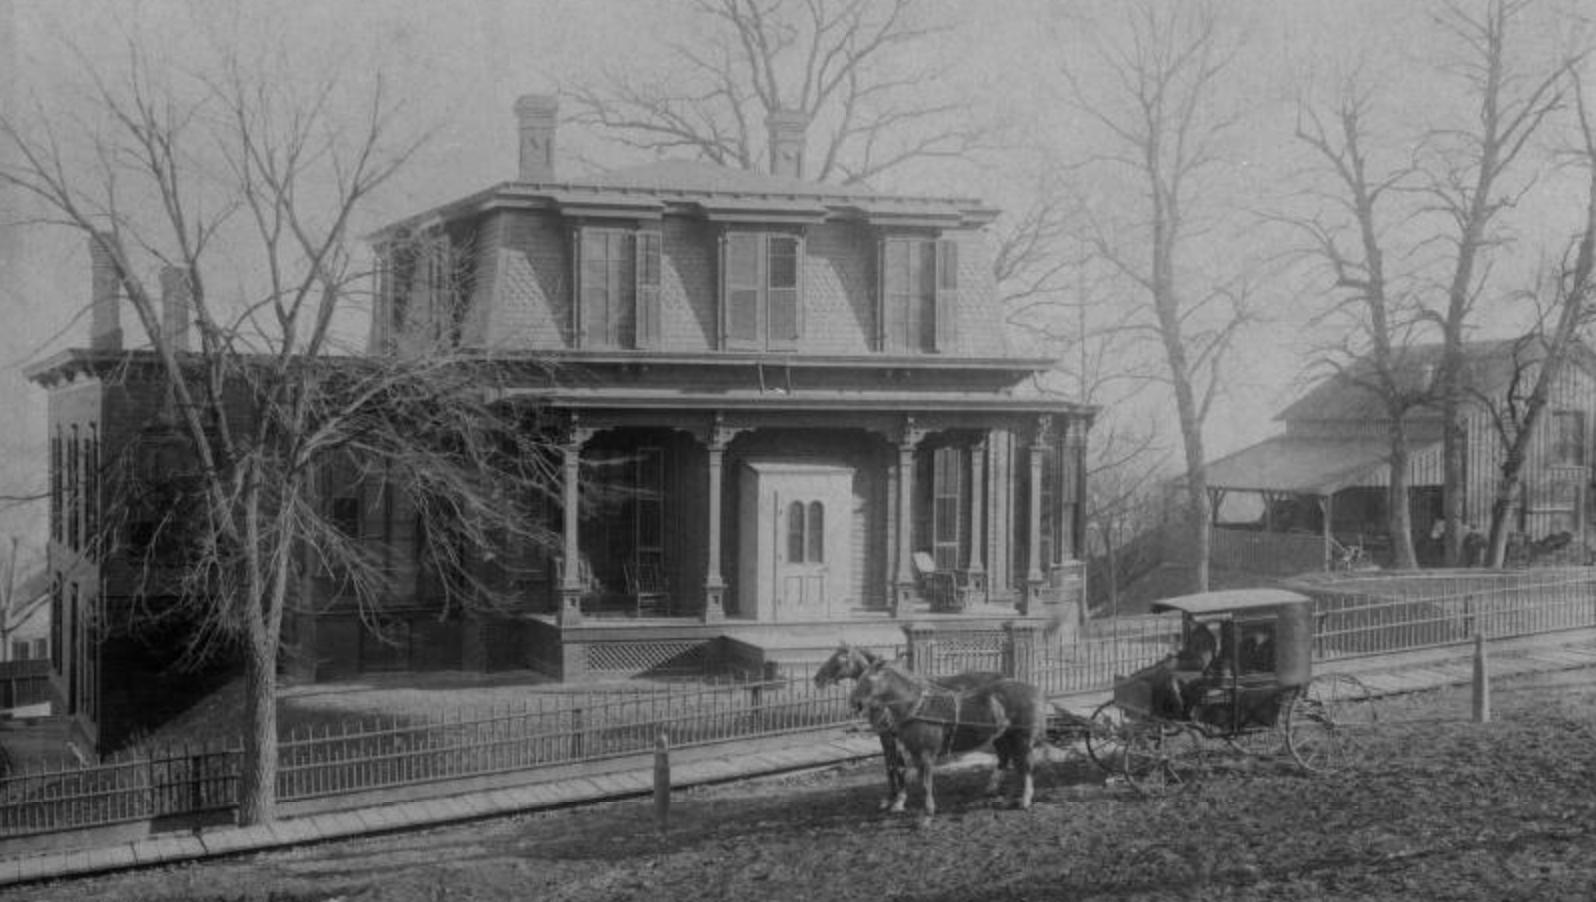 Thomas Kimball, Sr. Mansion, 1225 Park Wilde, Omaha, Nebraska